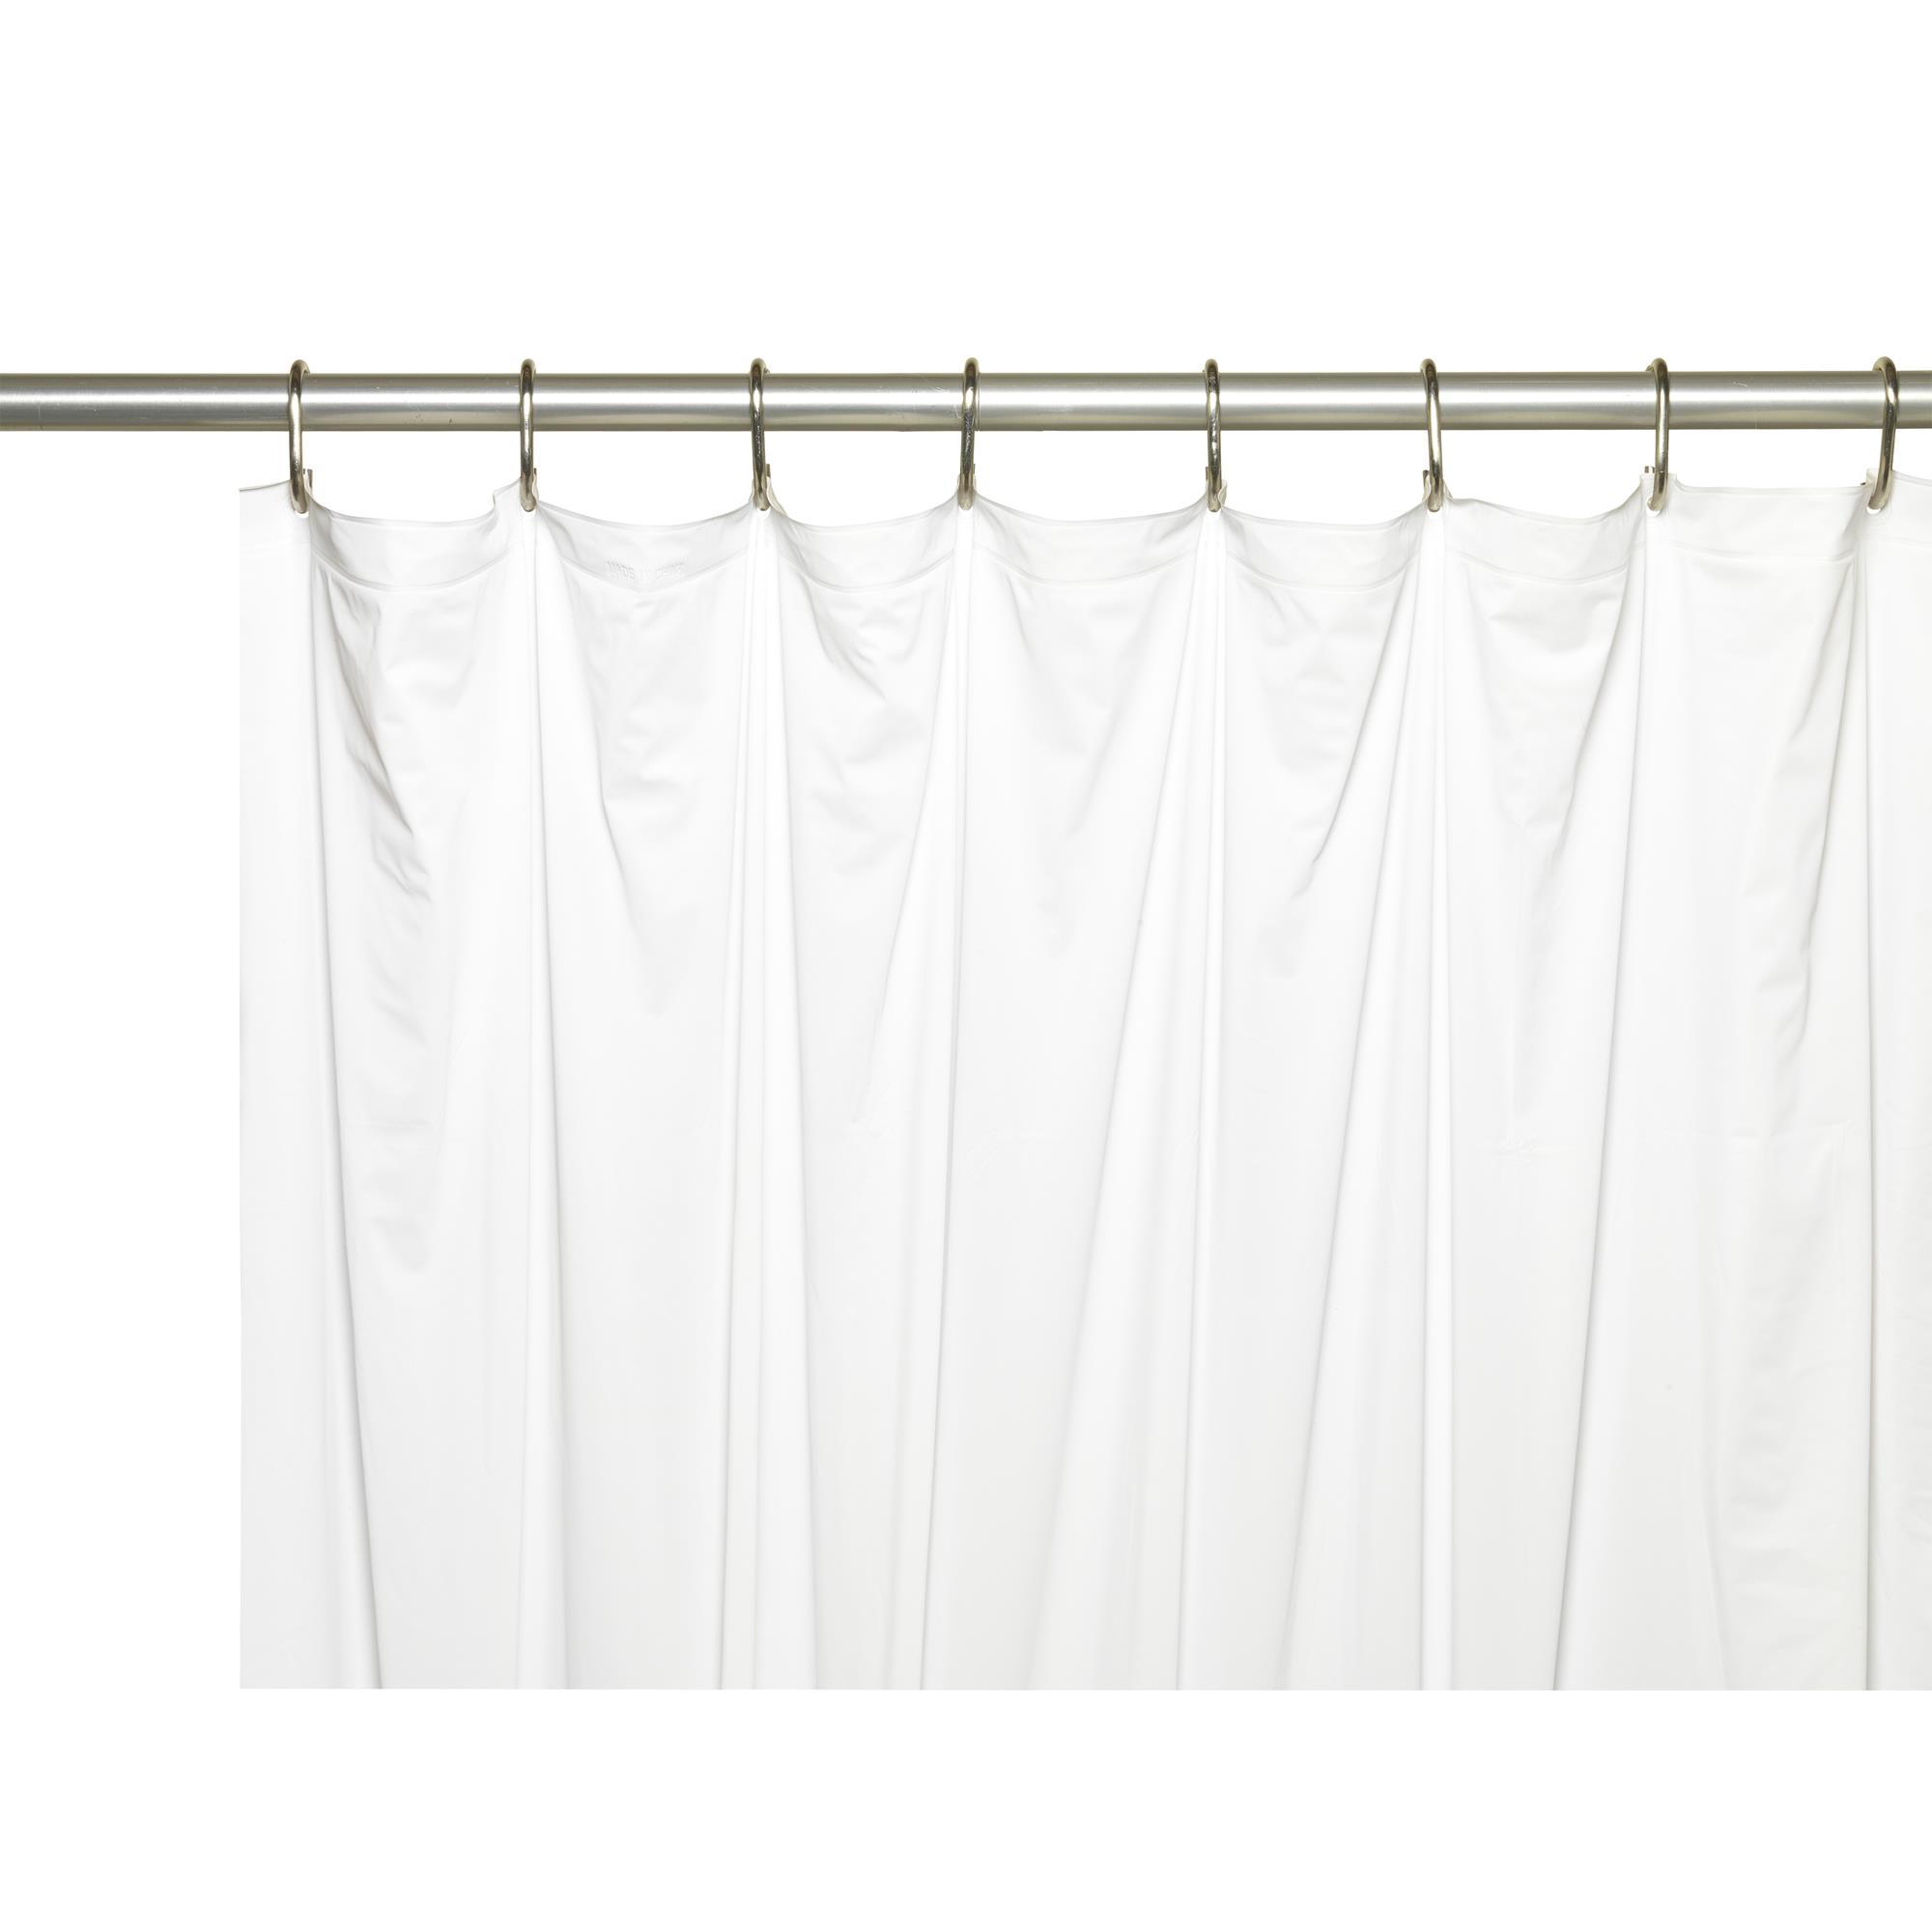 5 Gauge Vinyl Shower Curtain Liner in White Carnation Home Shower Stall-Sized